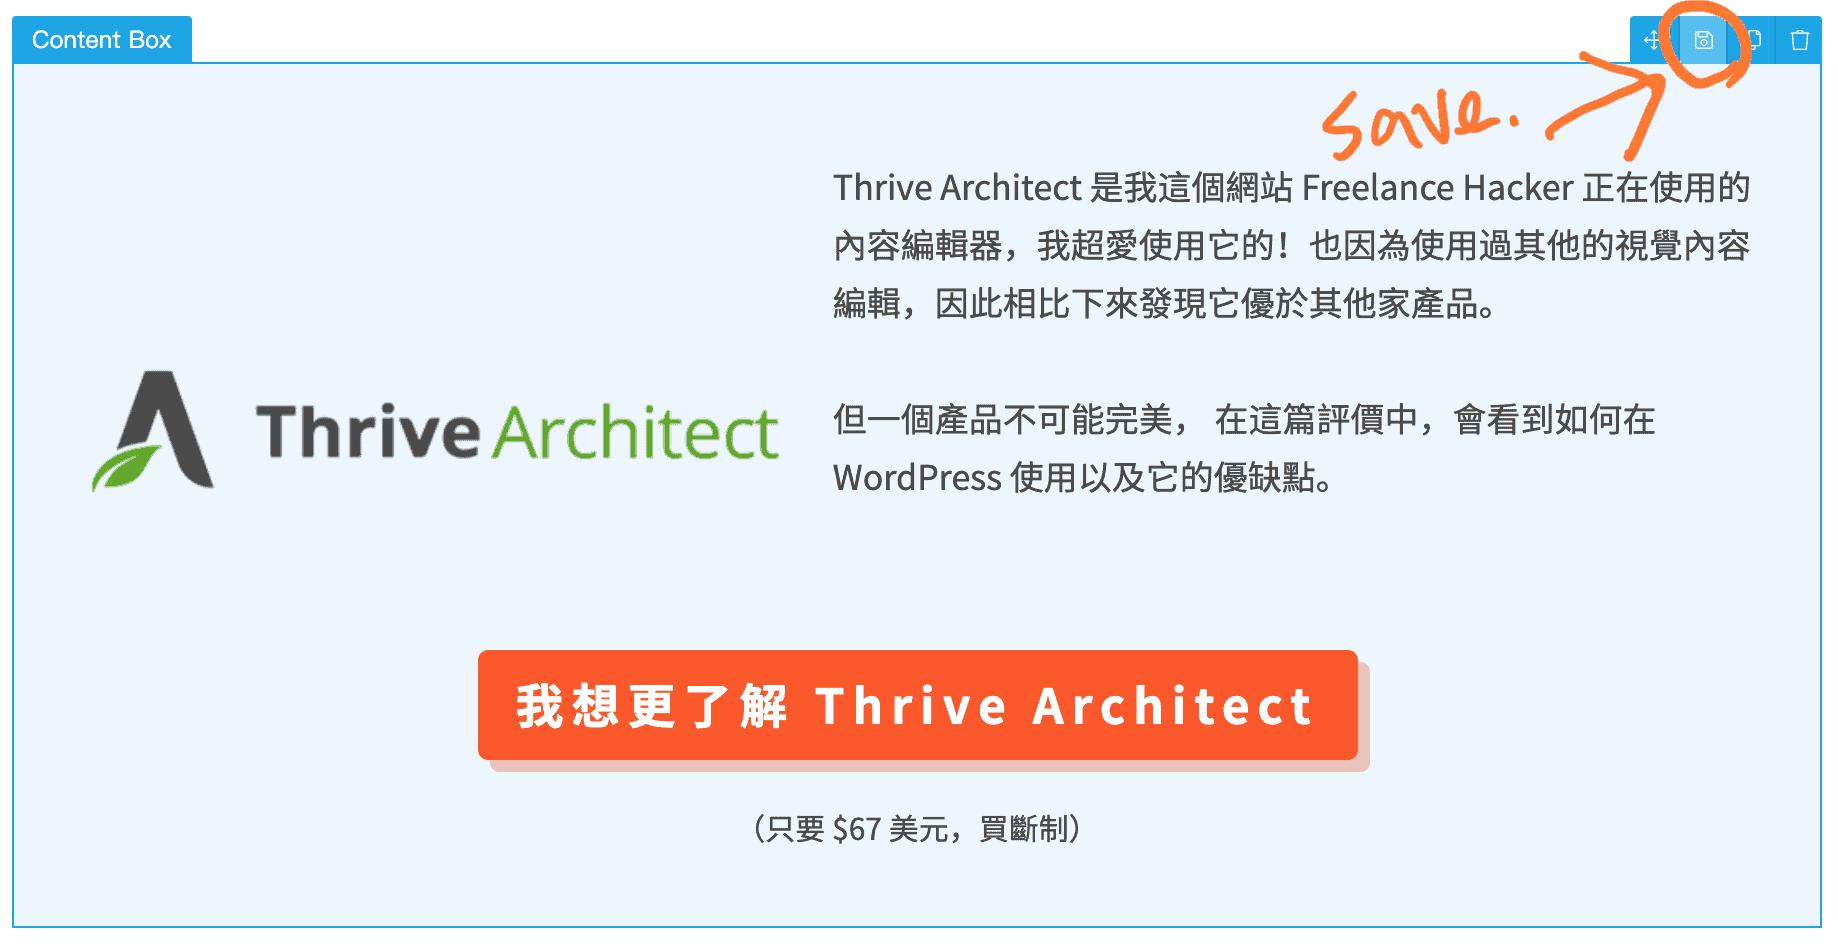 thrive-architect-儲存模板